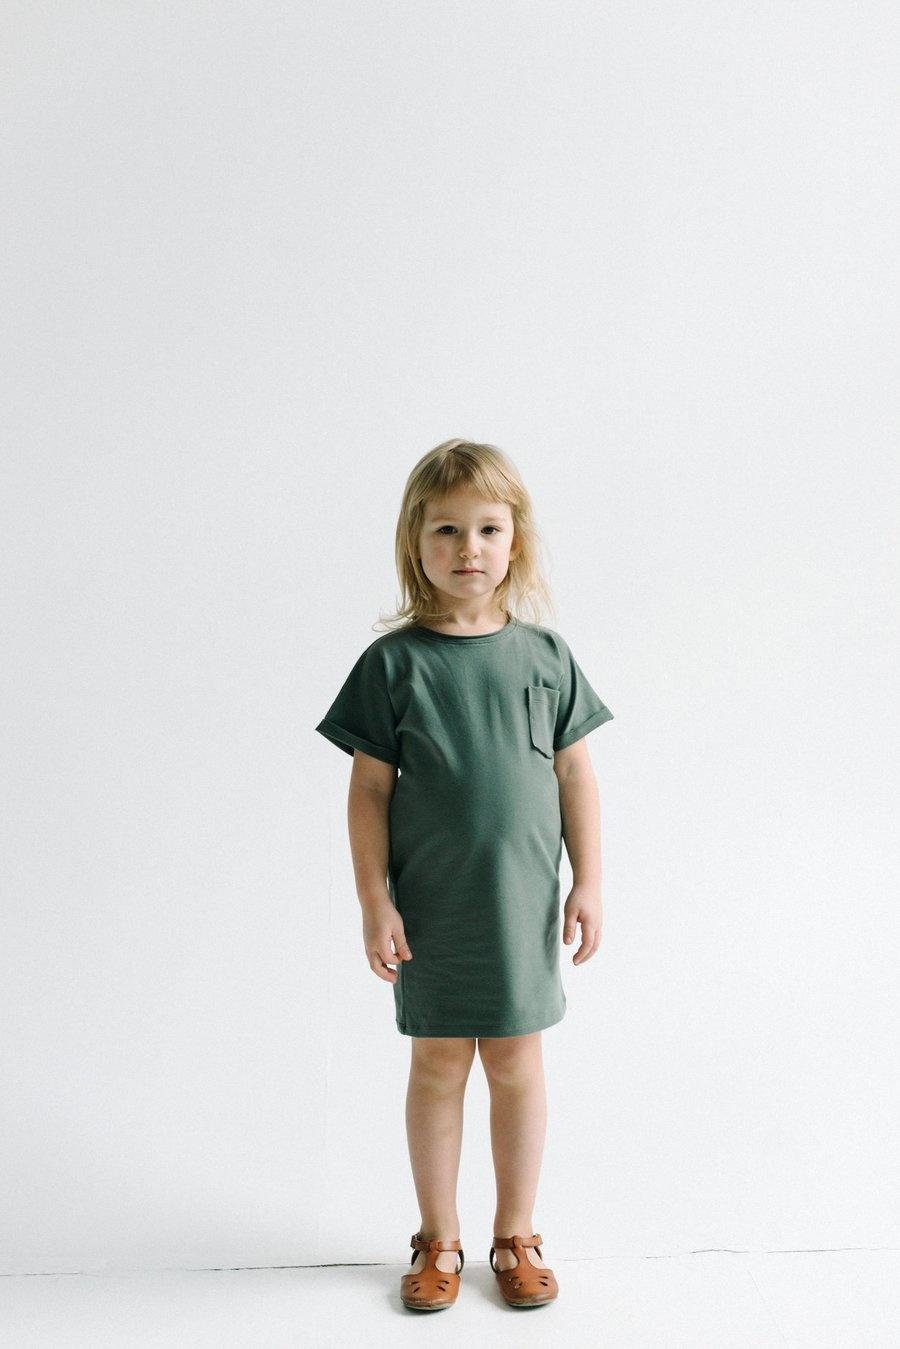 Kids T-shirt dress in forest green